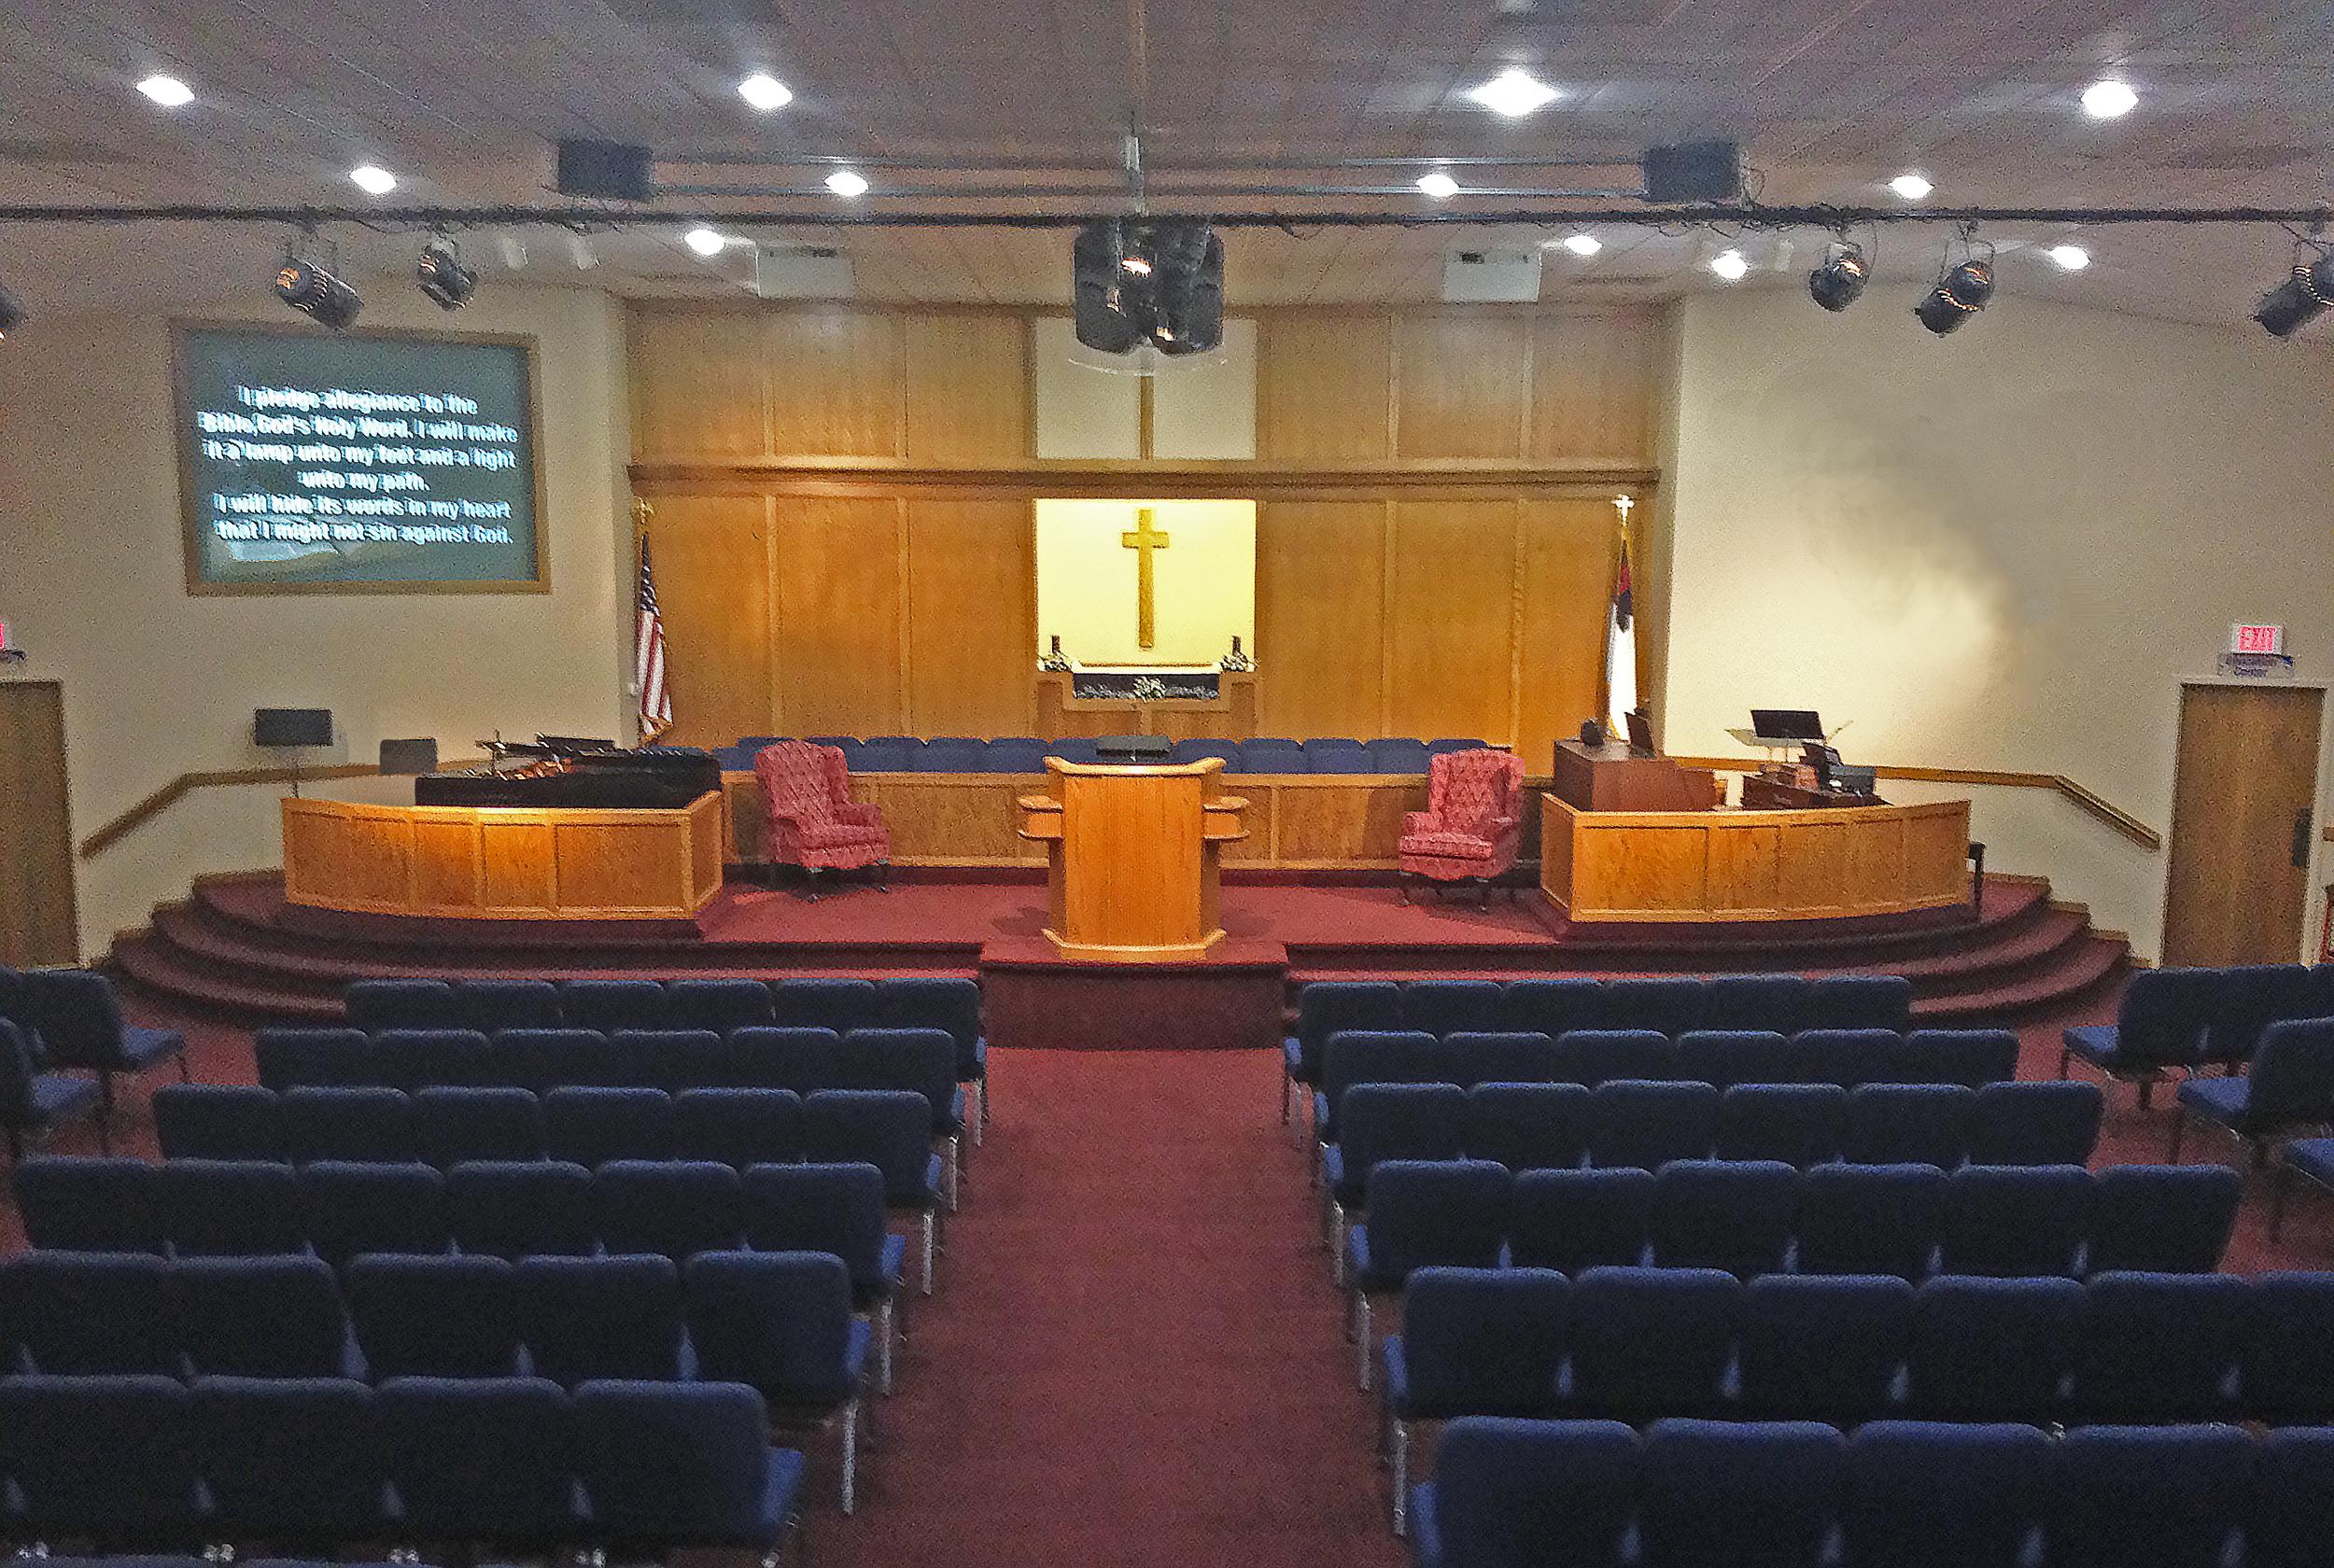 Remodeled Sanctuary